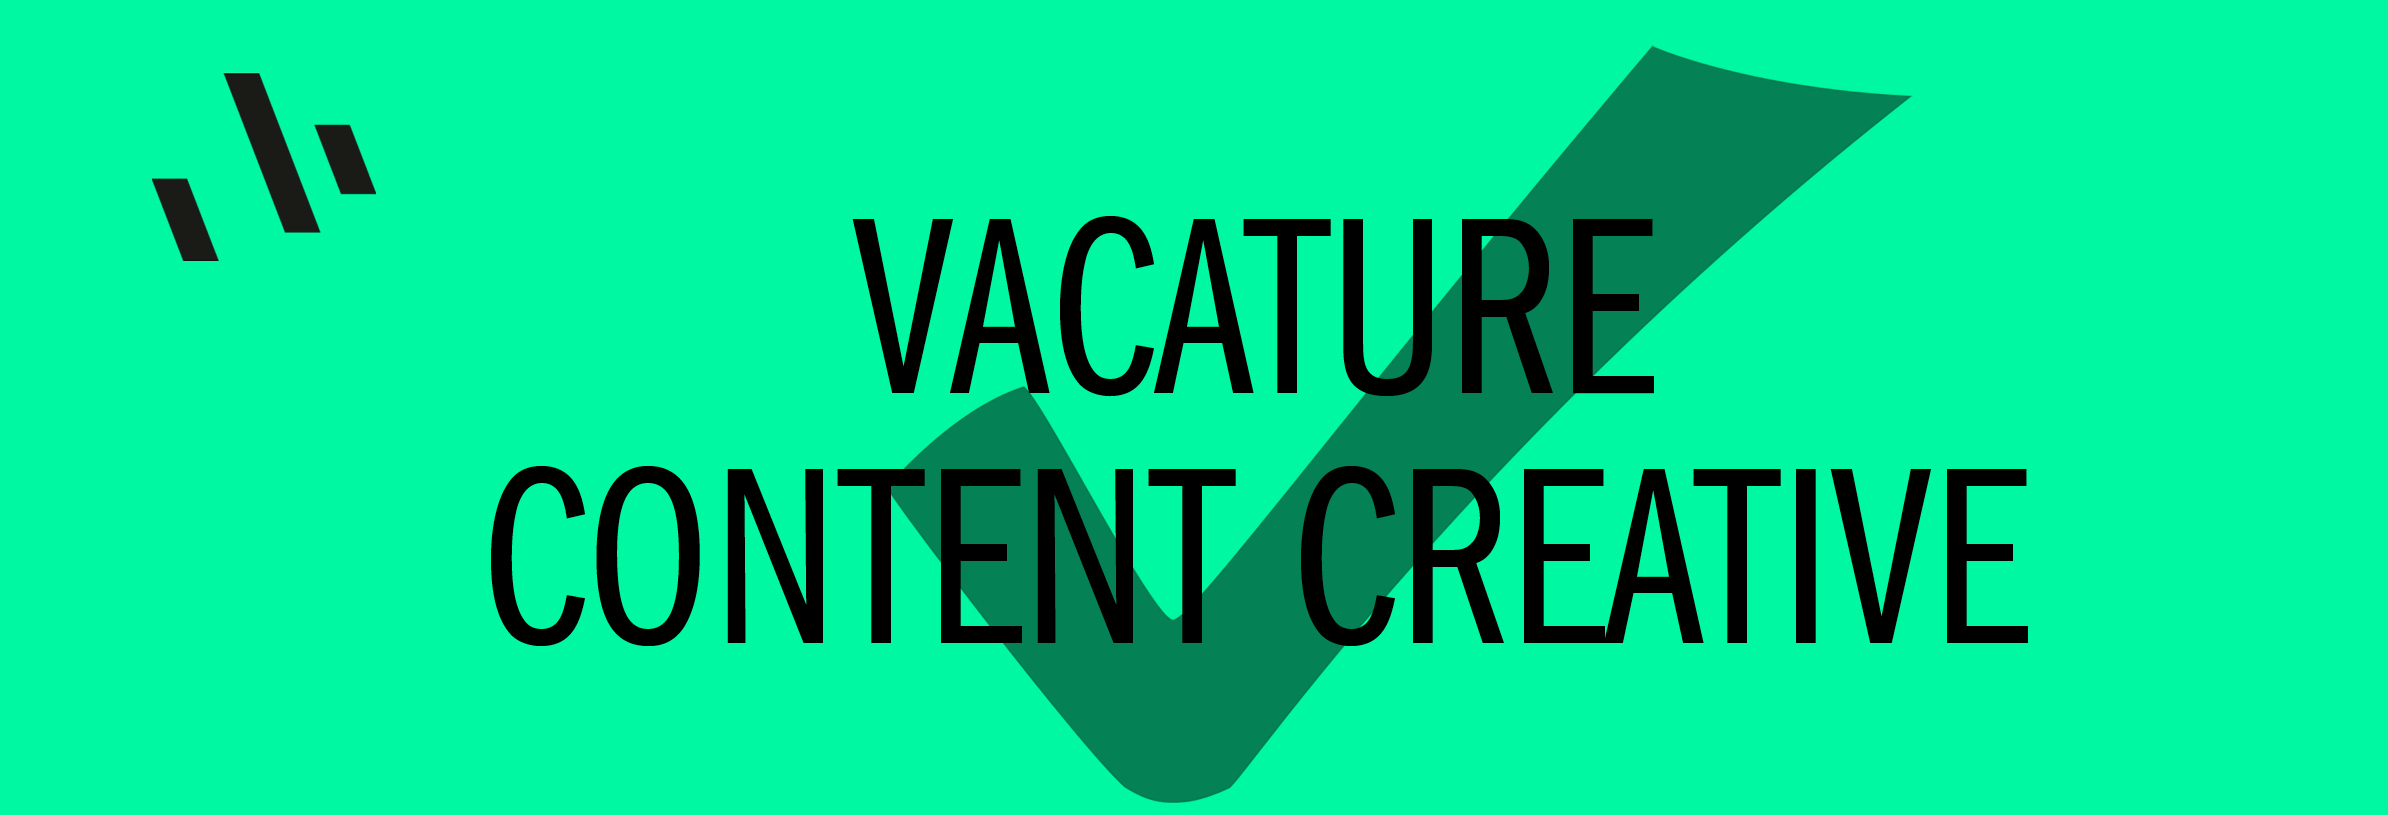 Vacature contentcreative vervuld